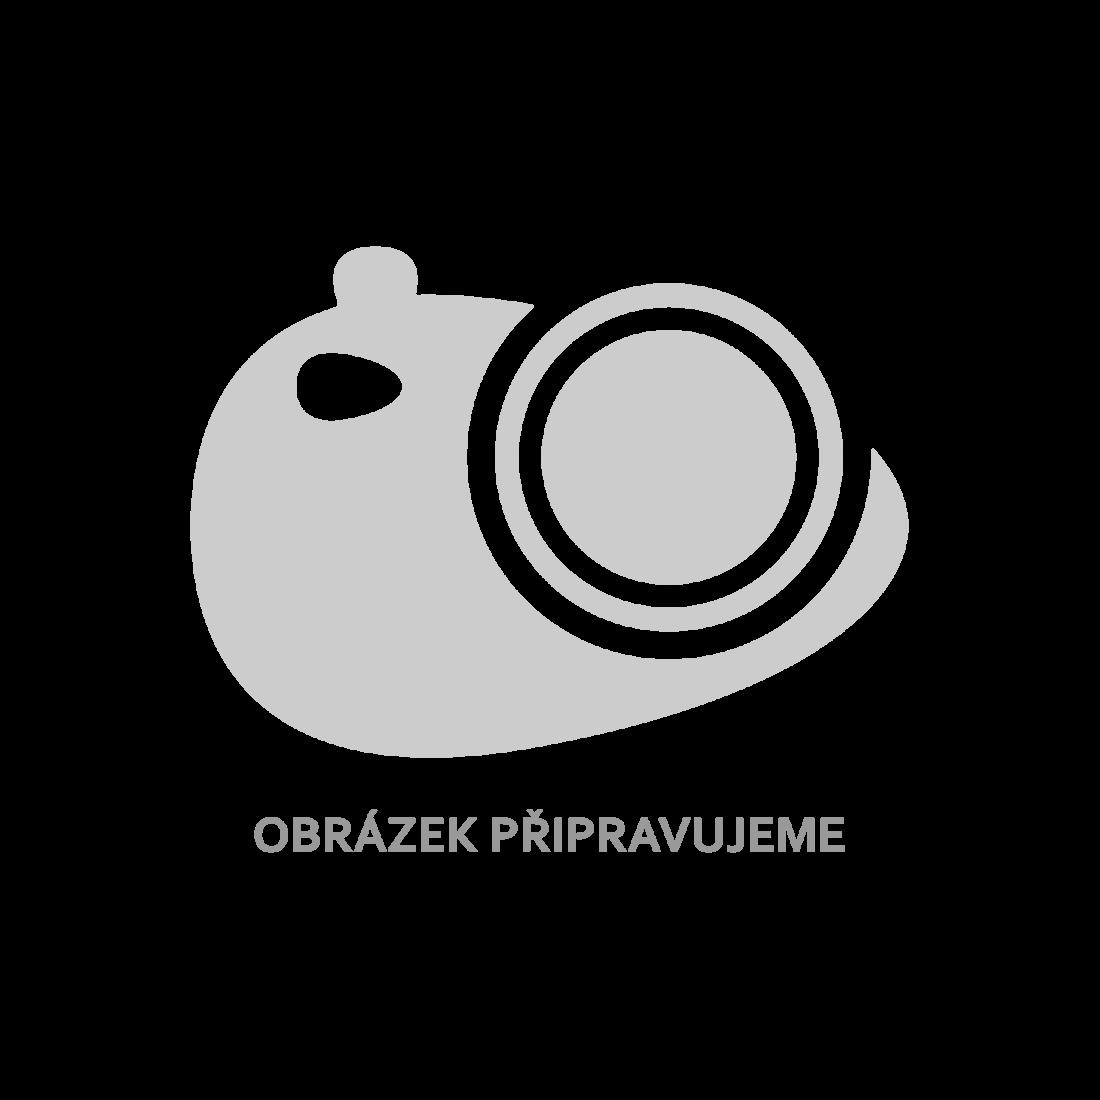 vidaXL 3dílná zahradní sedací souprava s poduškami bílá masiv borovice [805766]